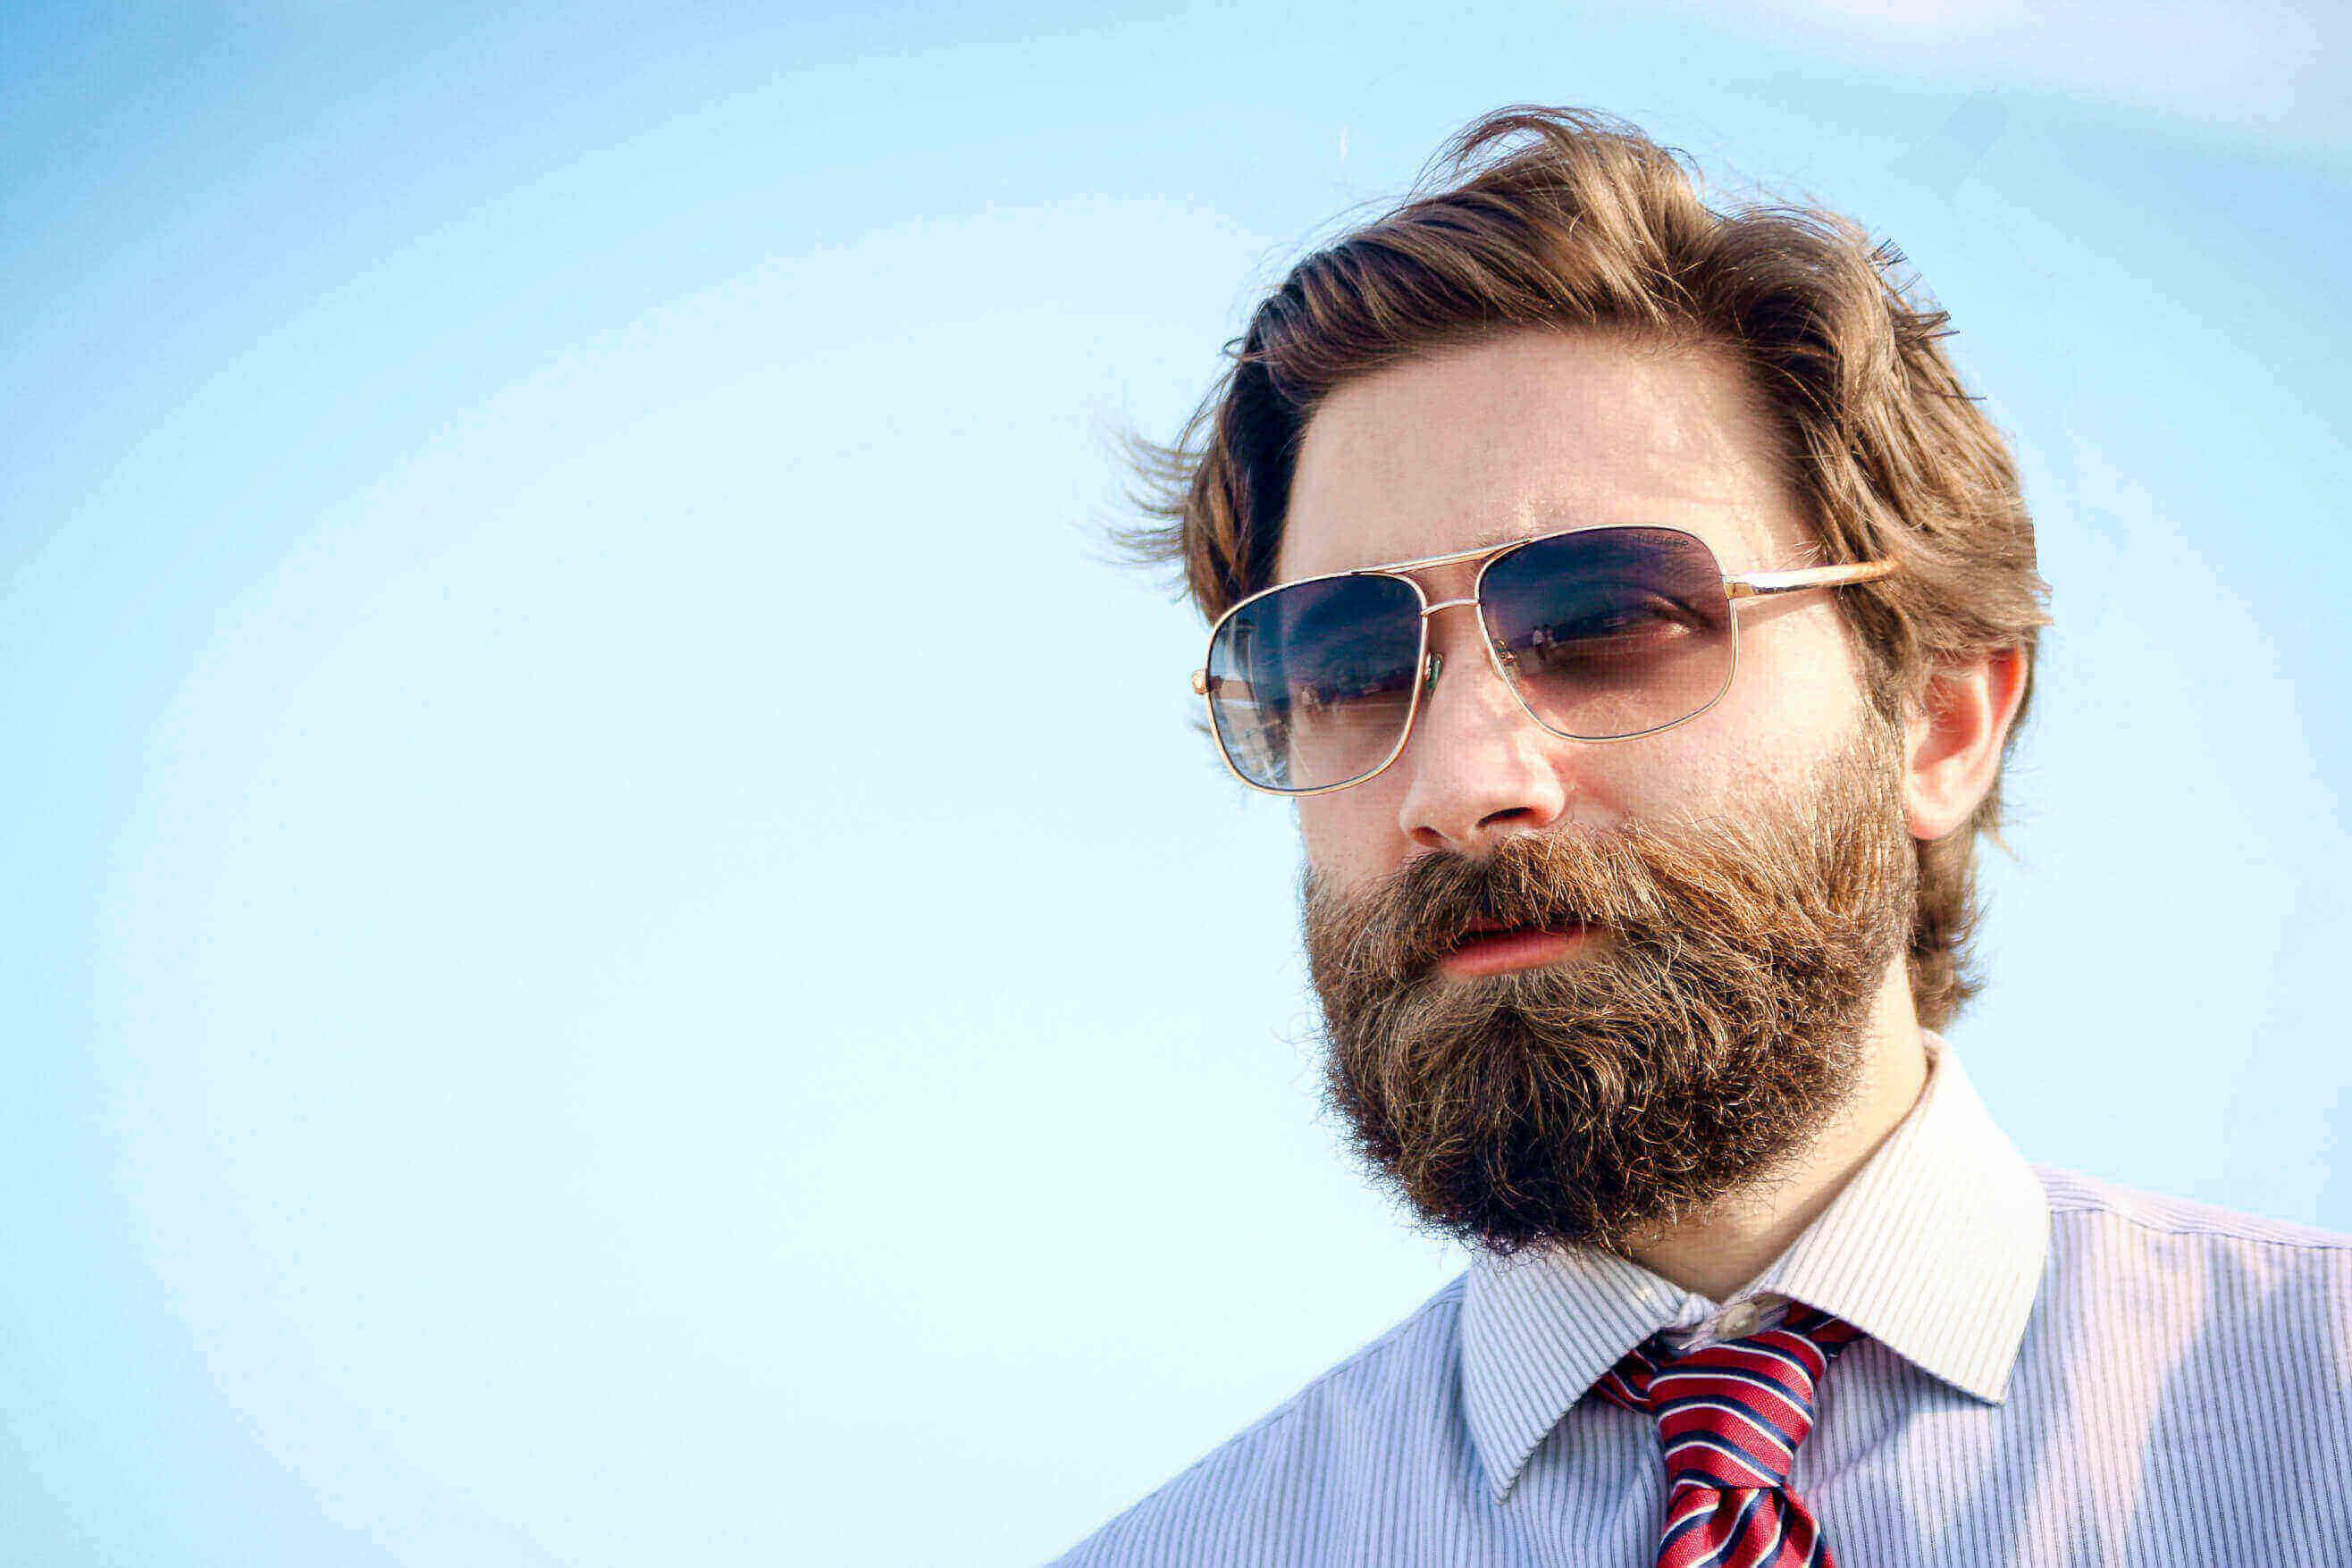 do women find beards attractive?